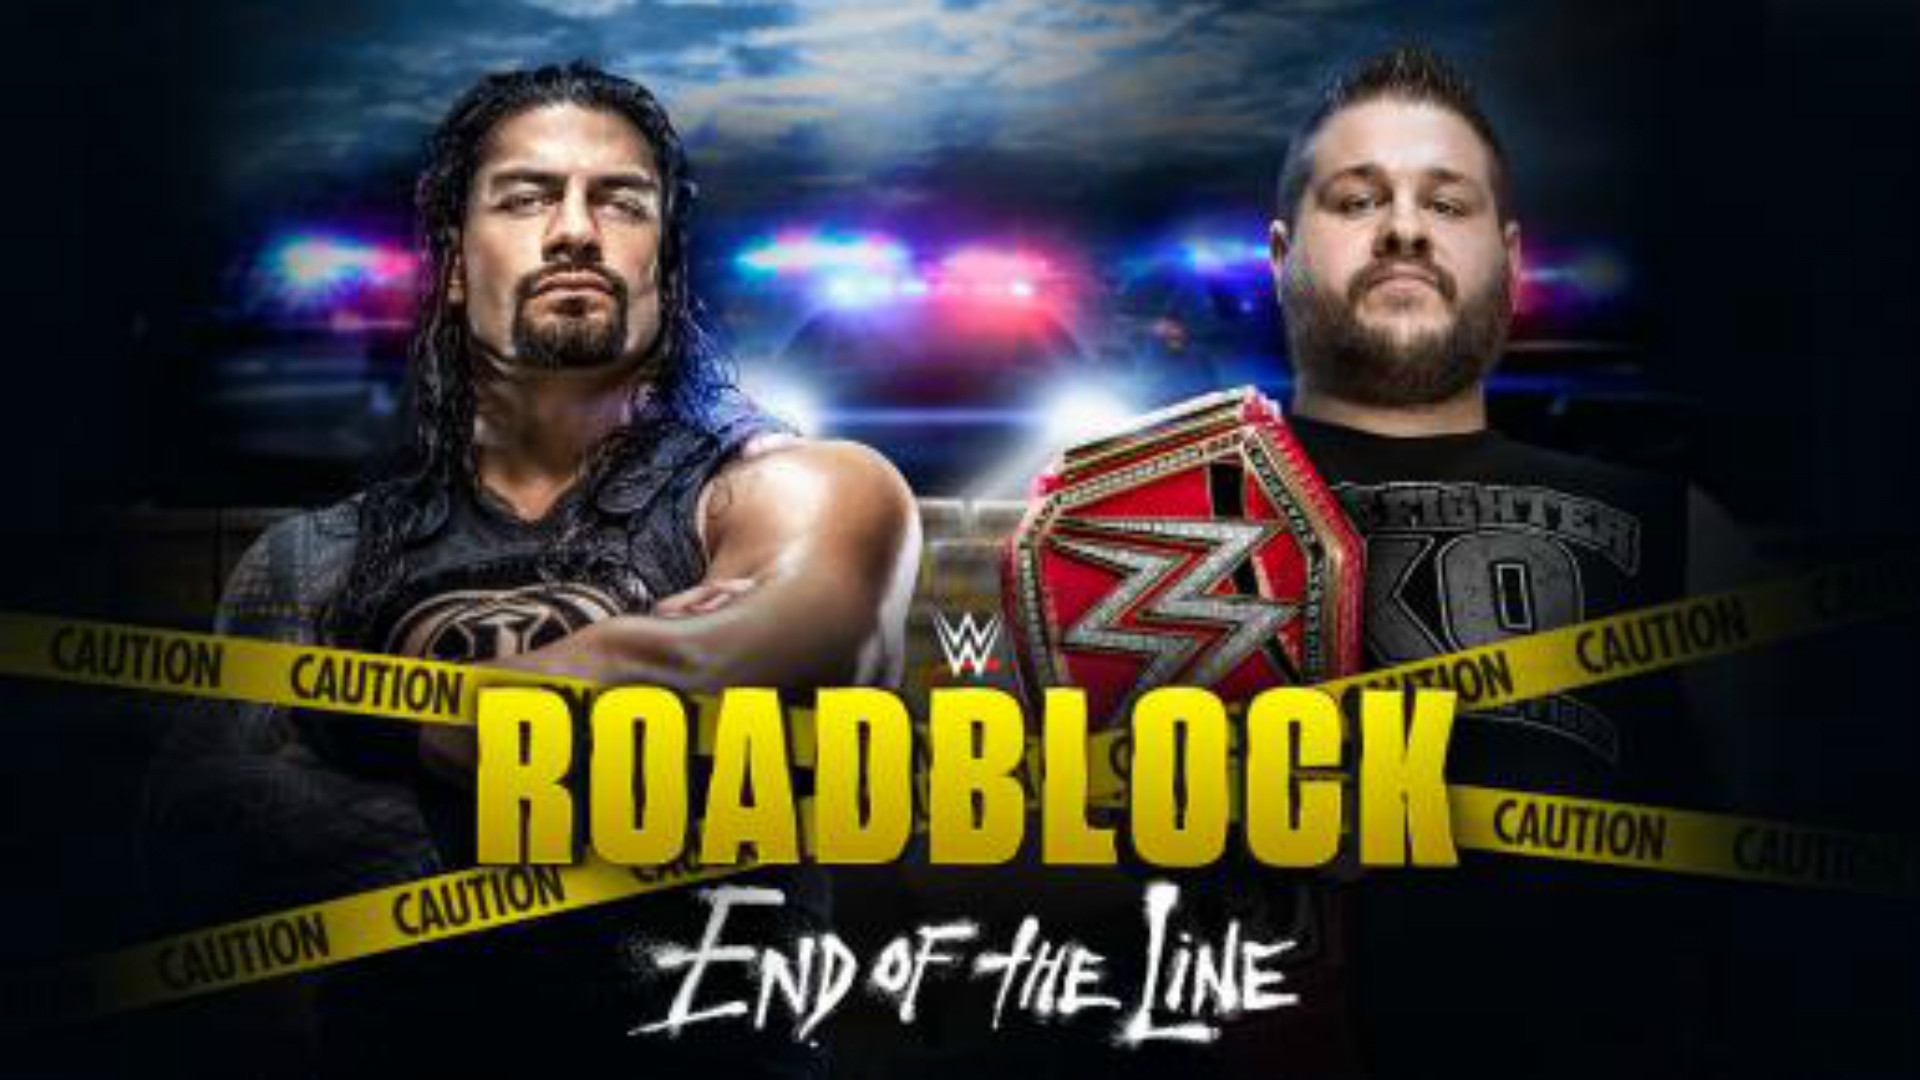 Don't miss WWE Roadblock, live on Sky Sports Box Office on Sunday night